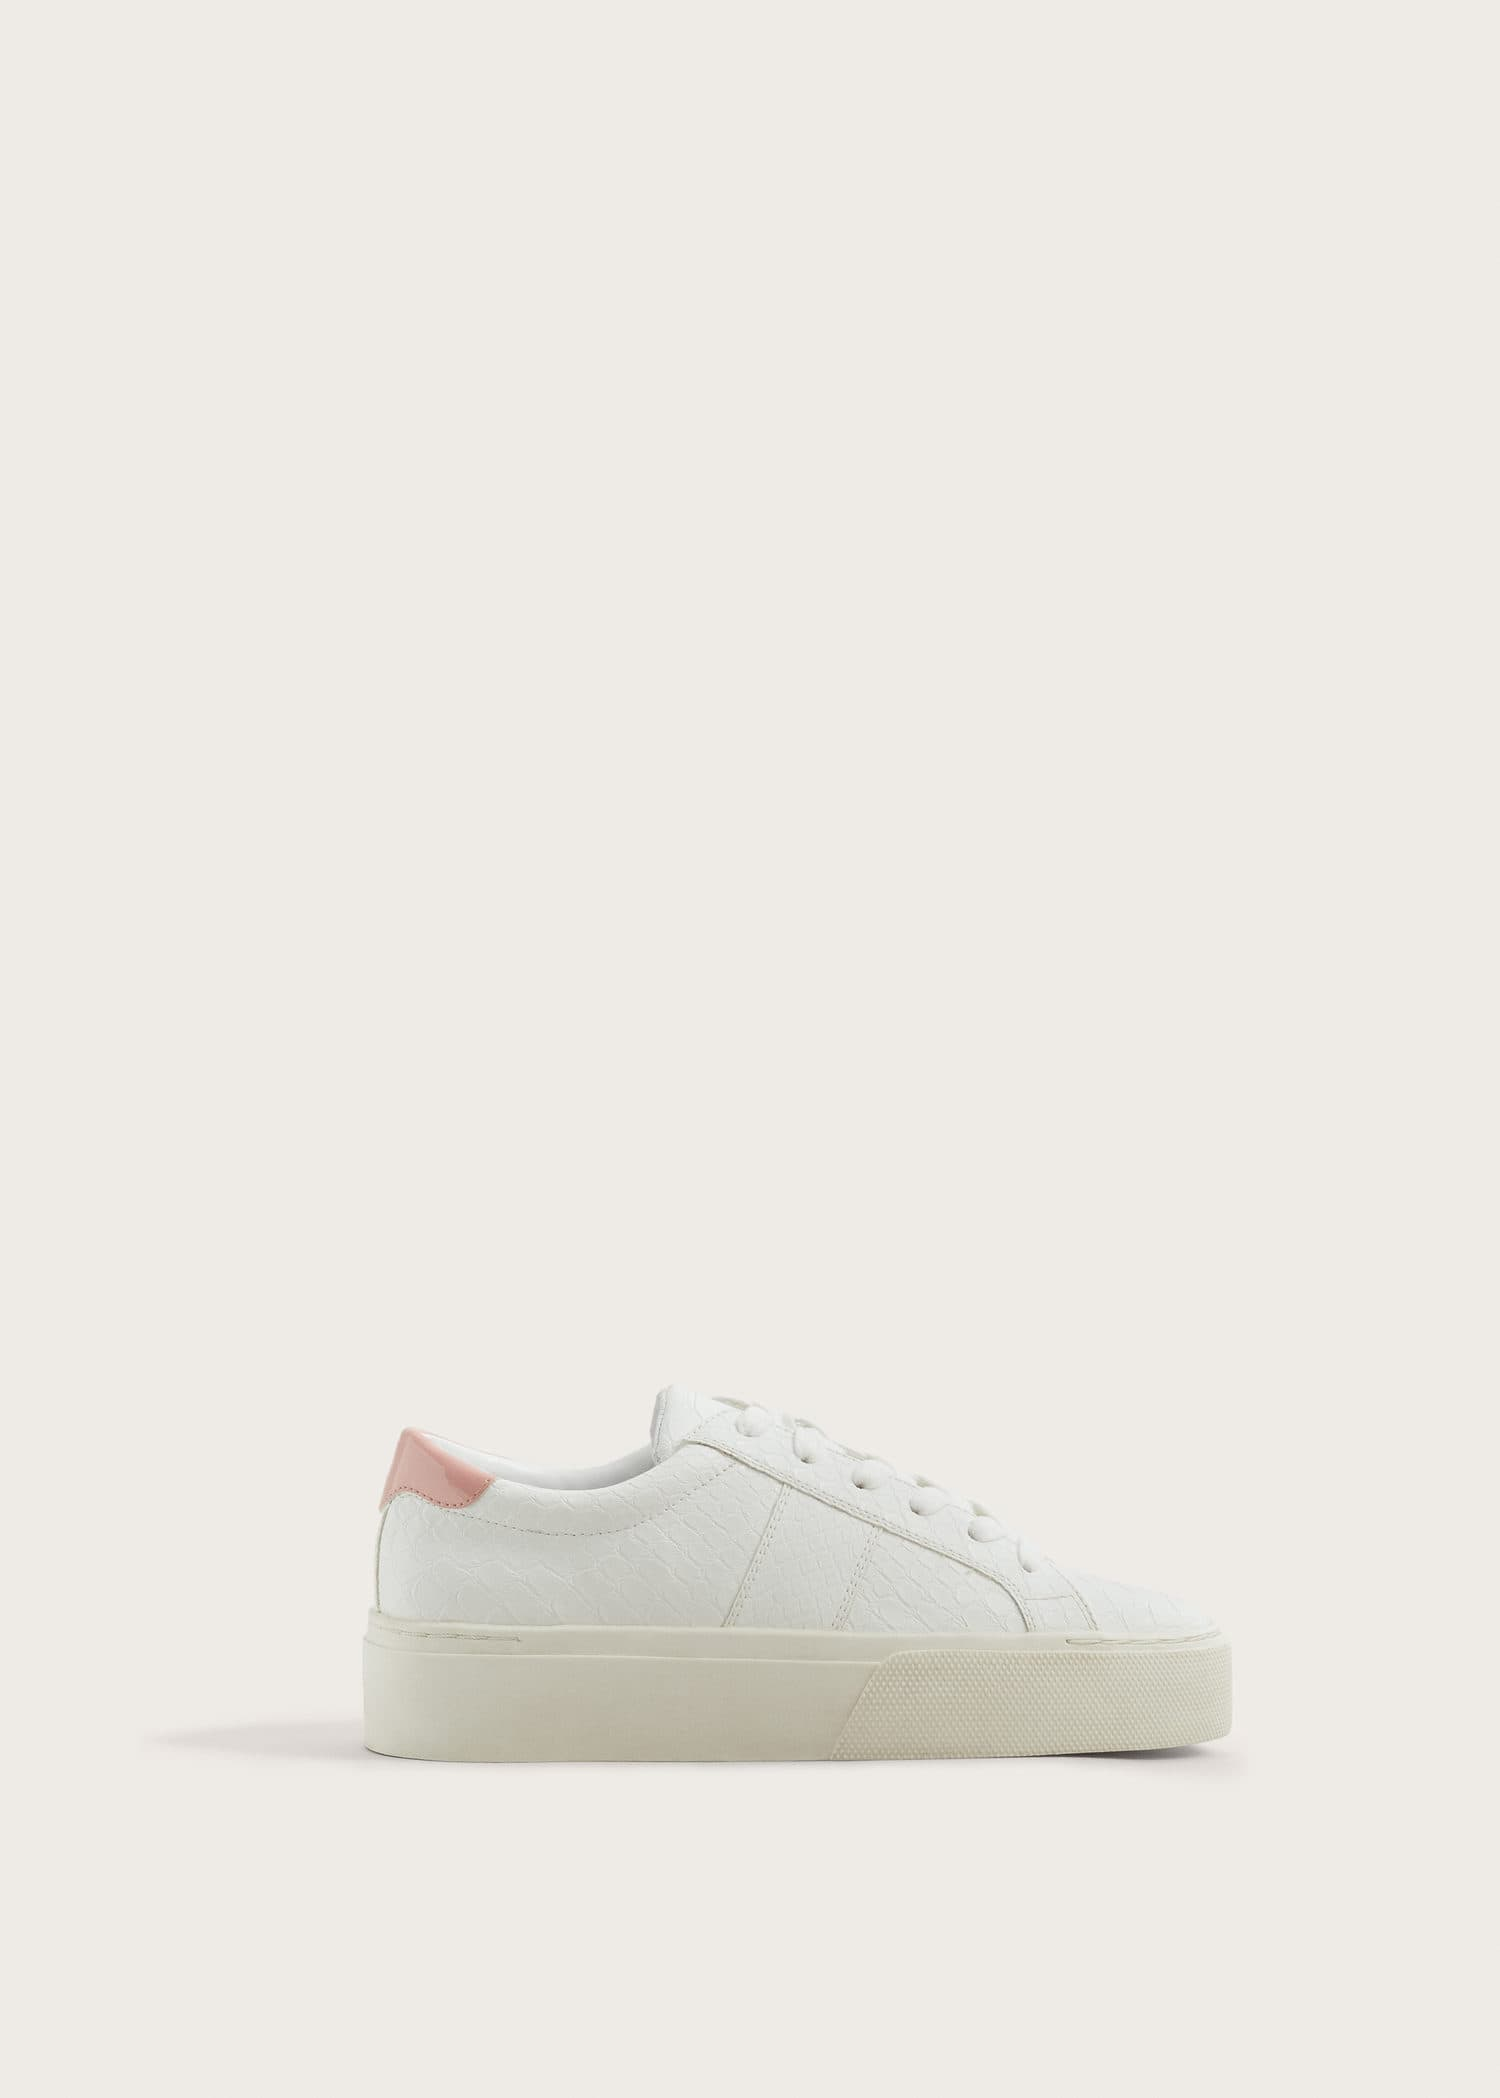 Geschnürte plateau sneakers Große größen | Violeta by